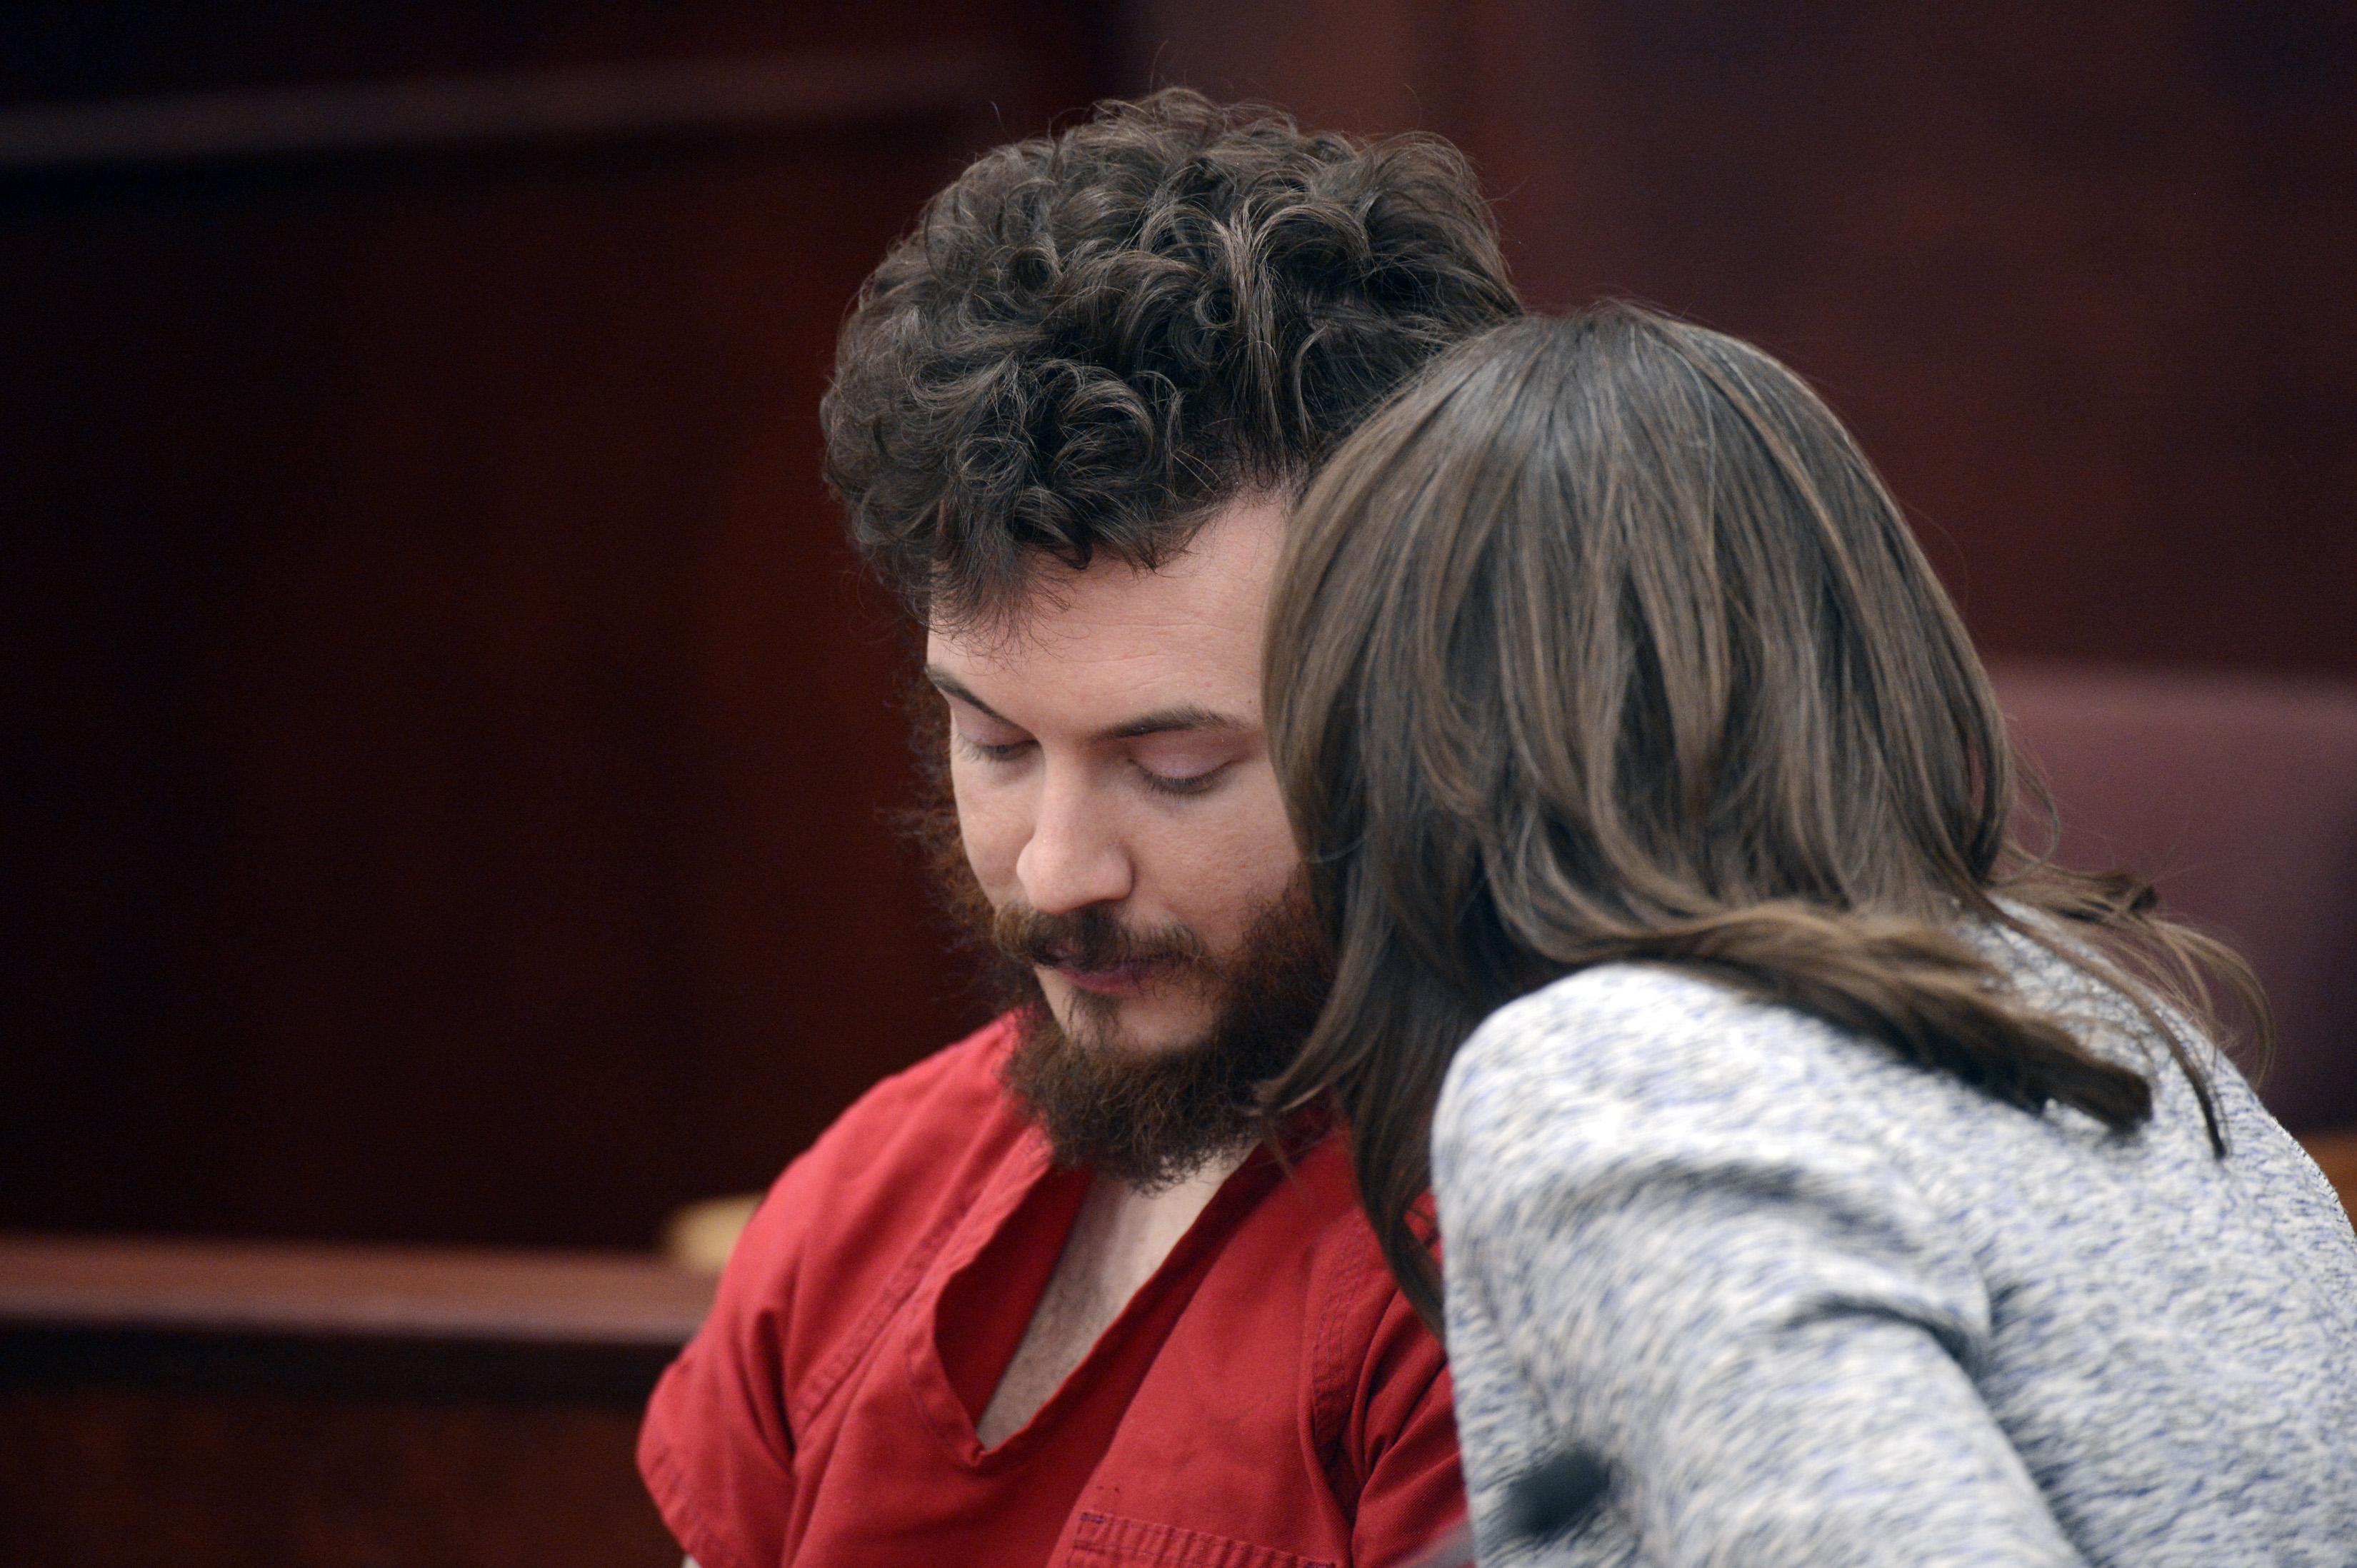 Photo: James Holmes listens to his defense attorney Tamara Brady in court